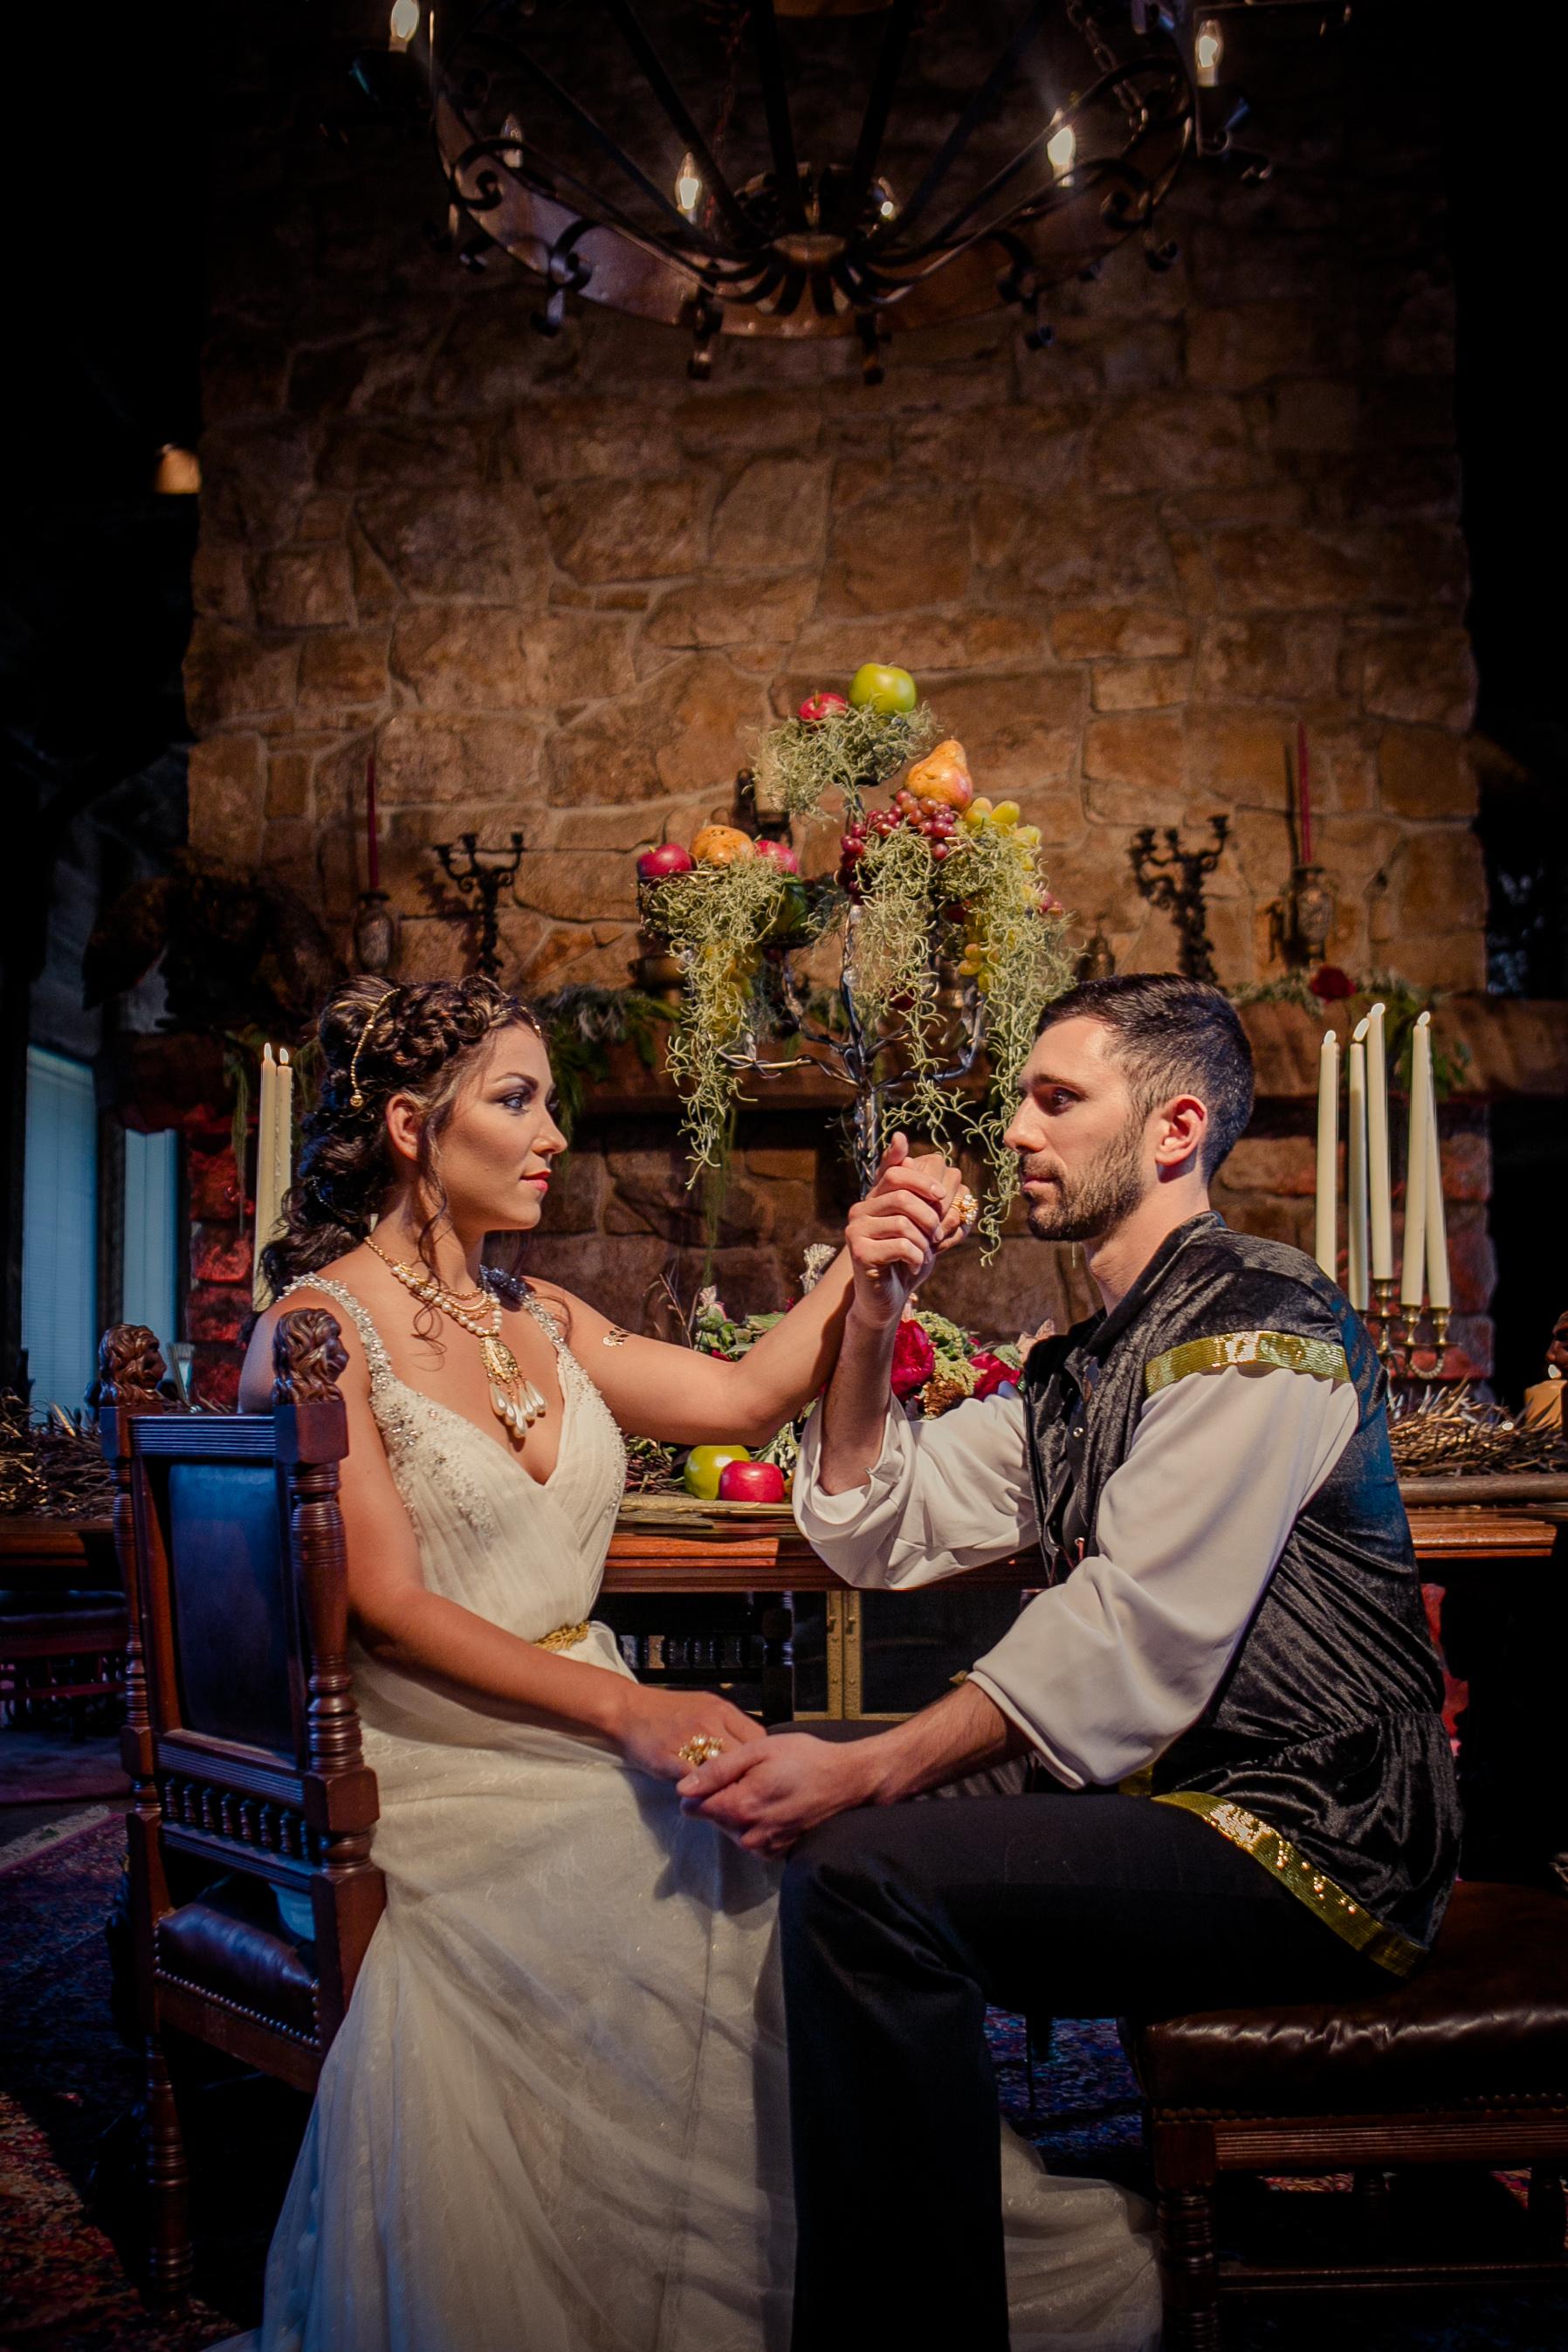 Wedding Lighting by Correlation Productions